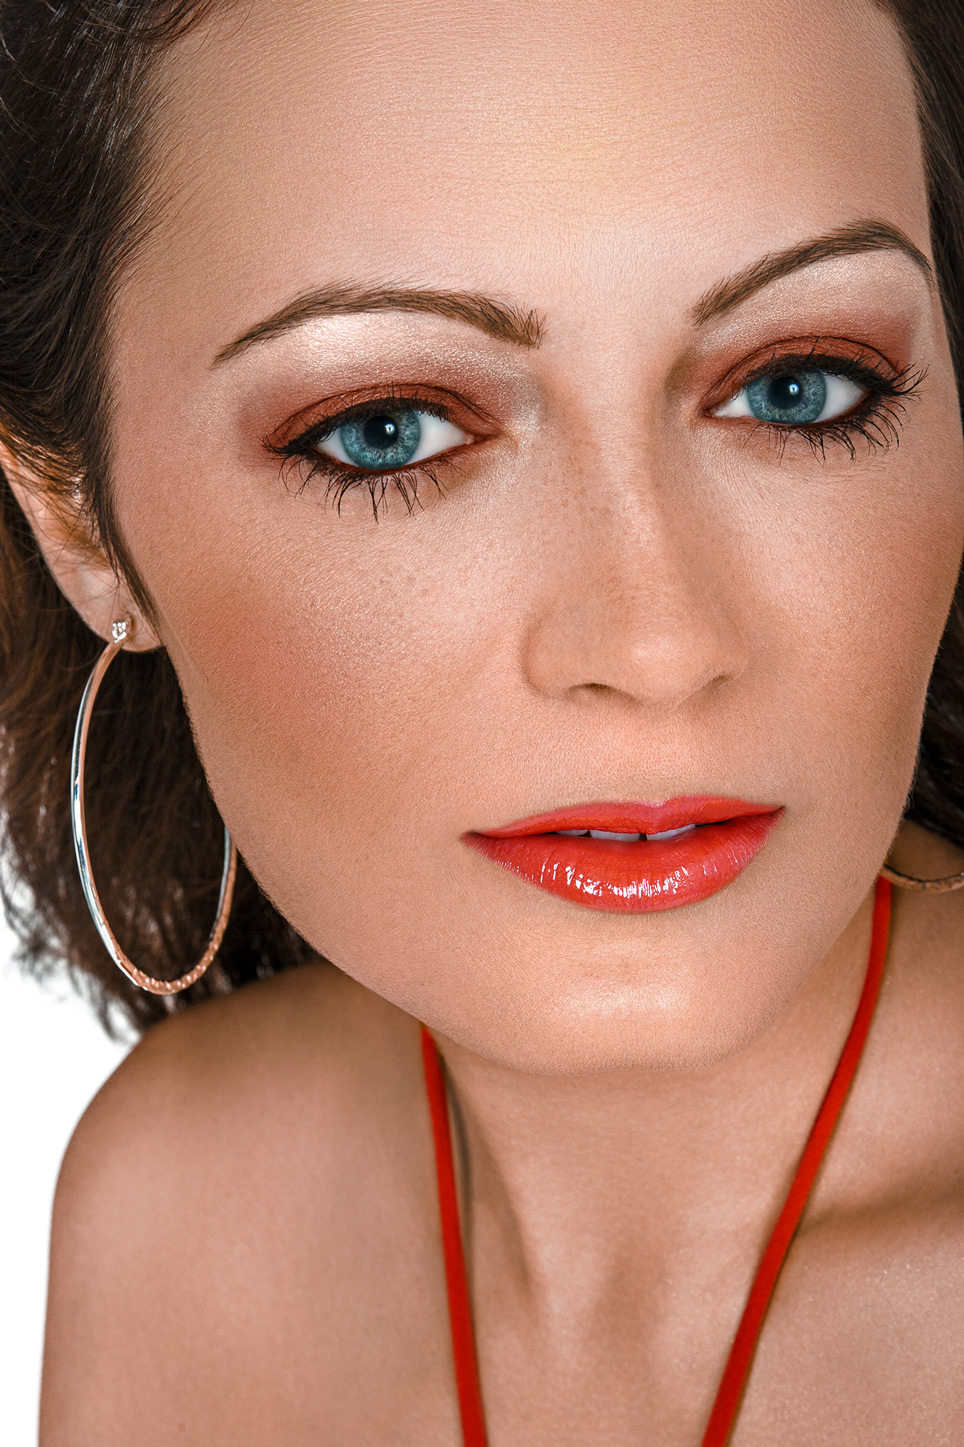 headshot of model and actress